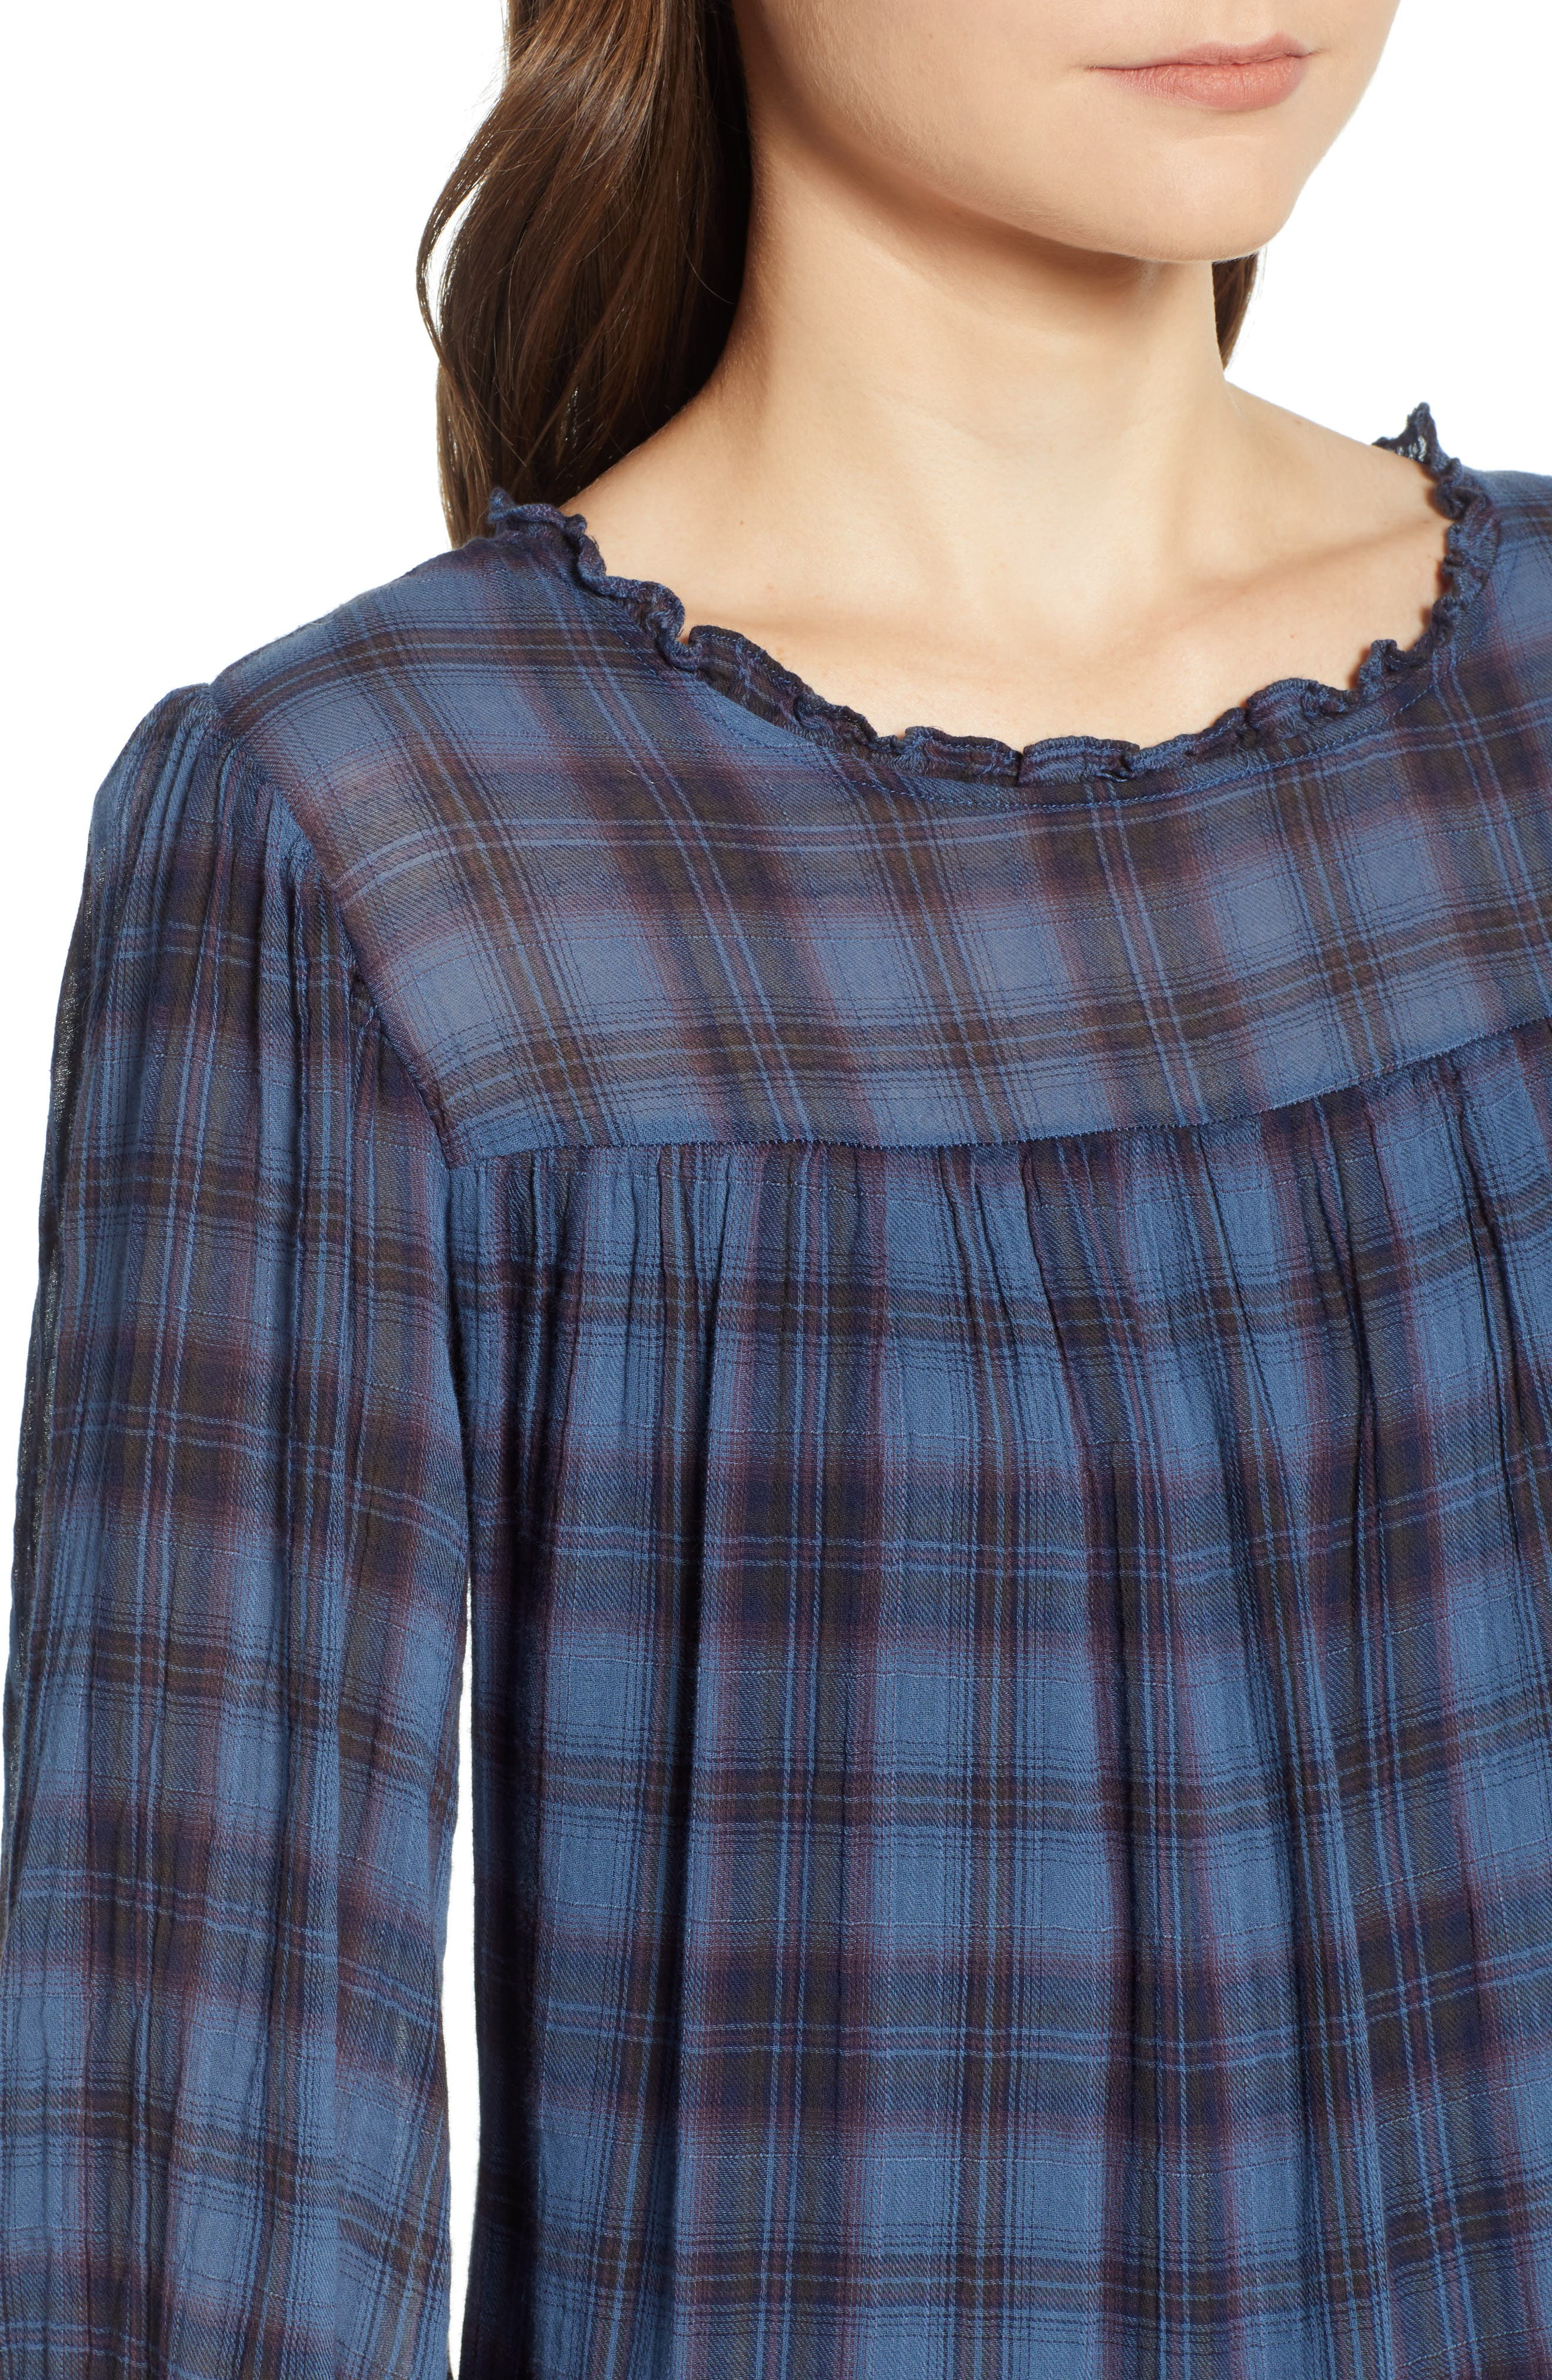 Soft Tiered Plaid Cotton Shift Dress,                             Alternate thumbnail 4, color,                             437